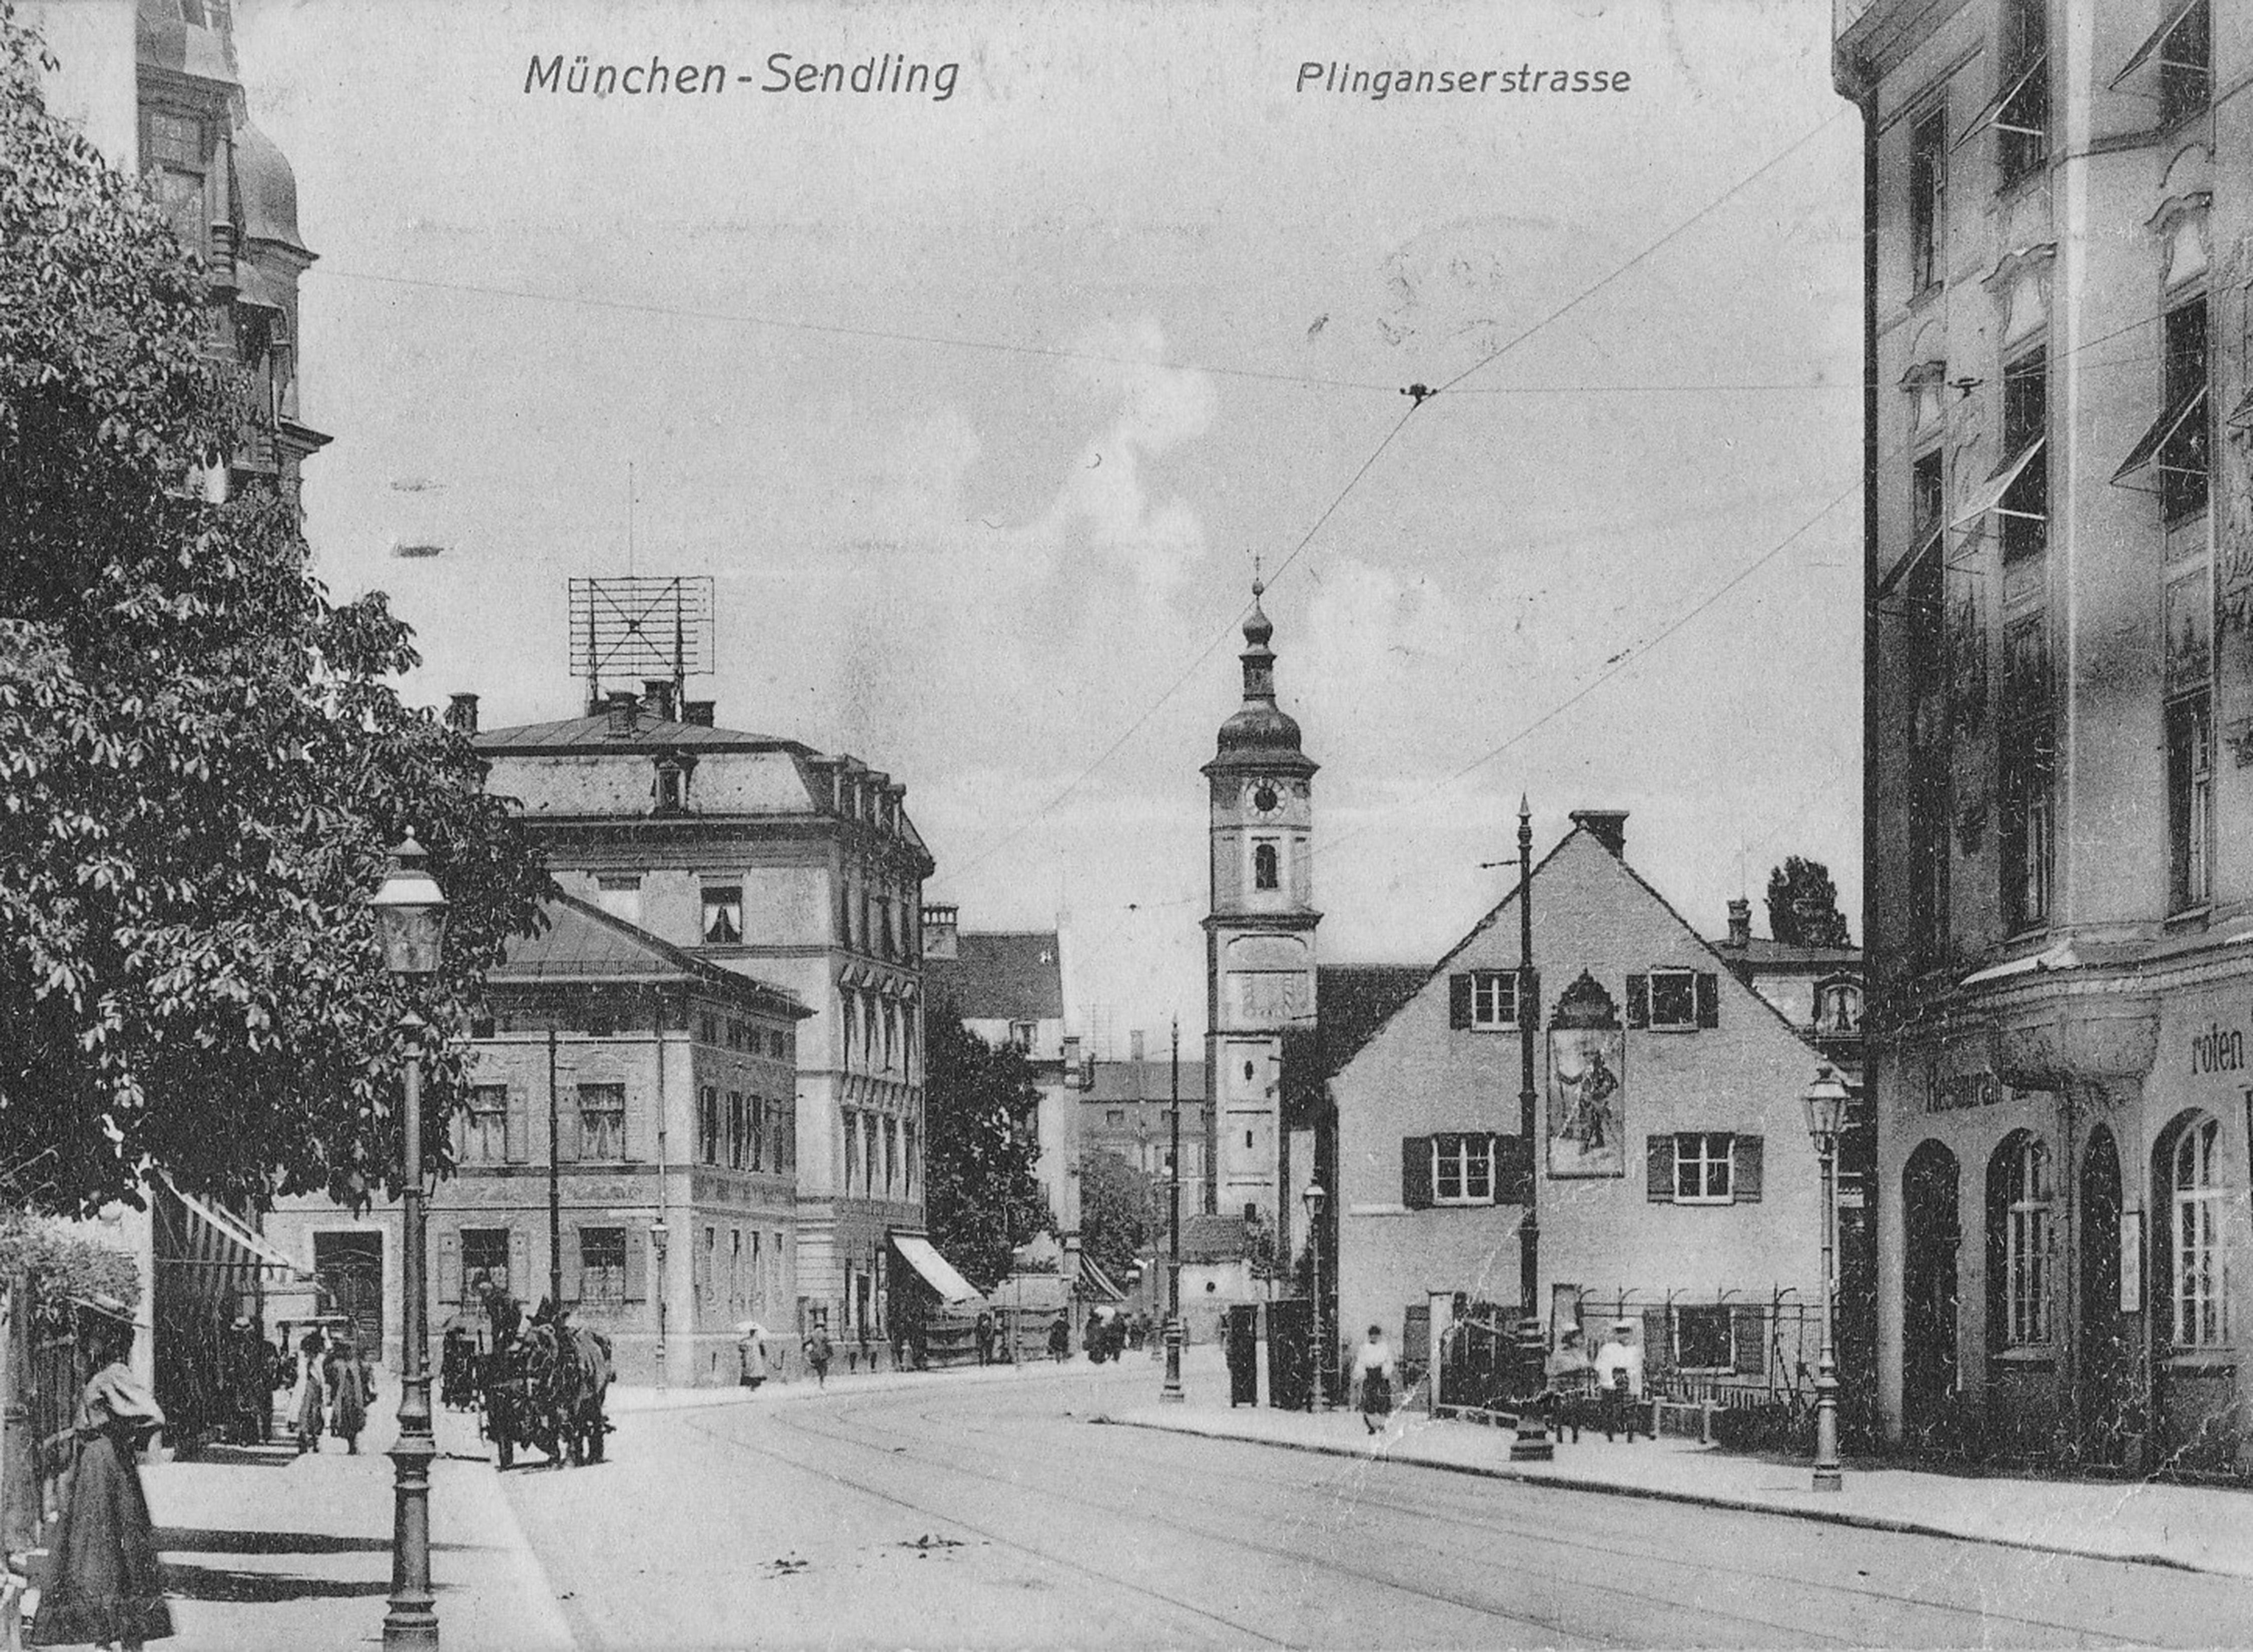 1920 - Untersendling